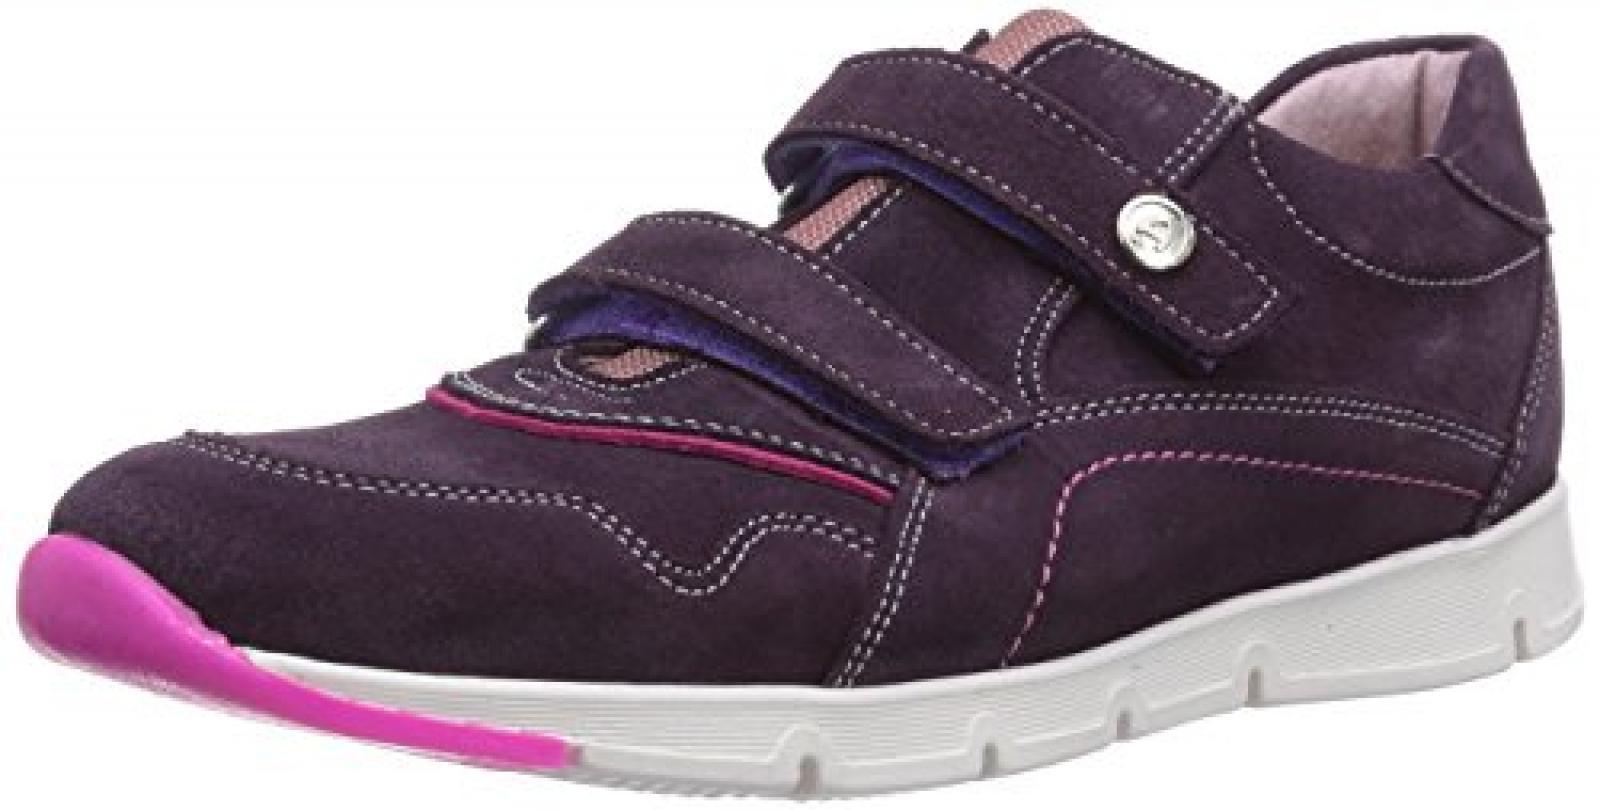 Däumling Jana - Julia Mädchen Sneakers